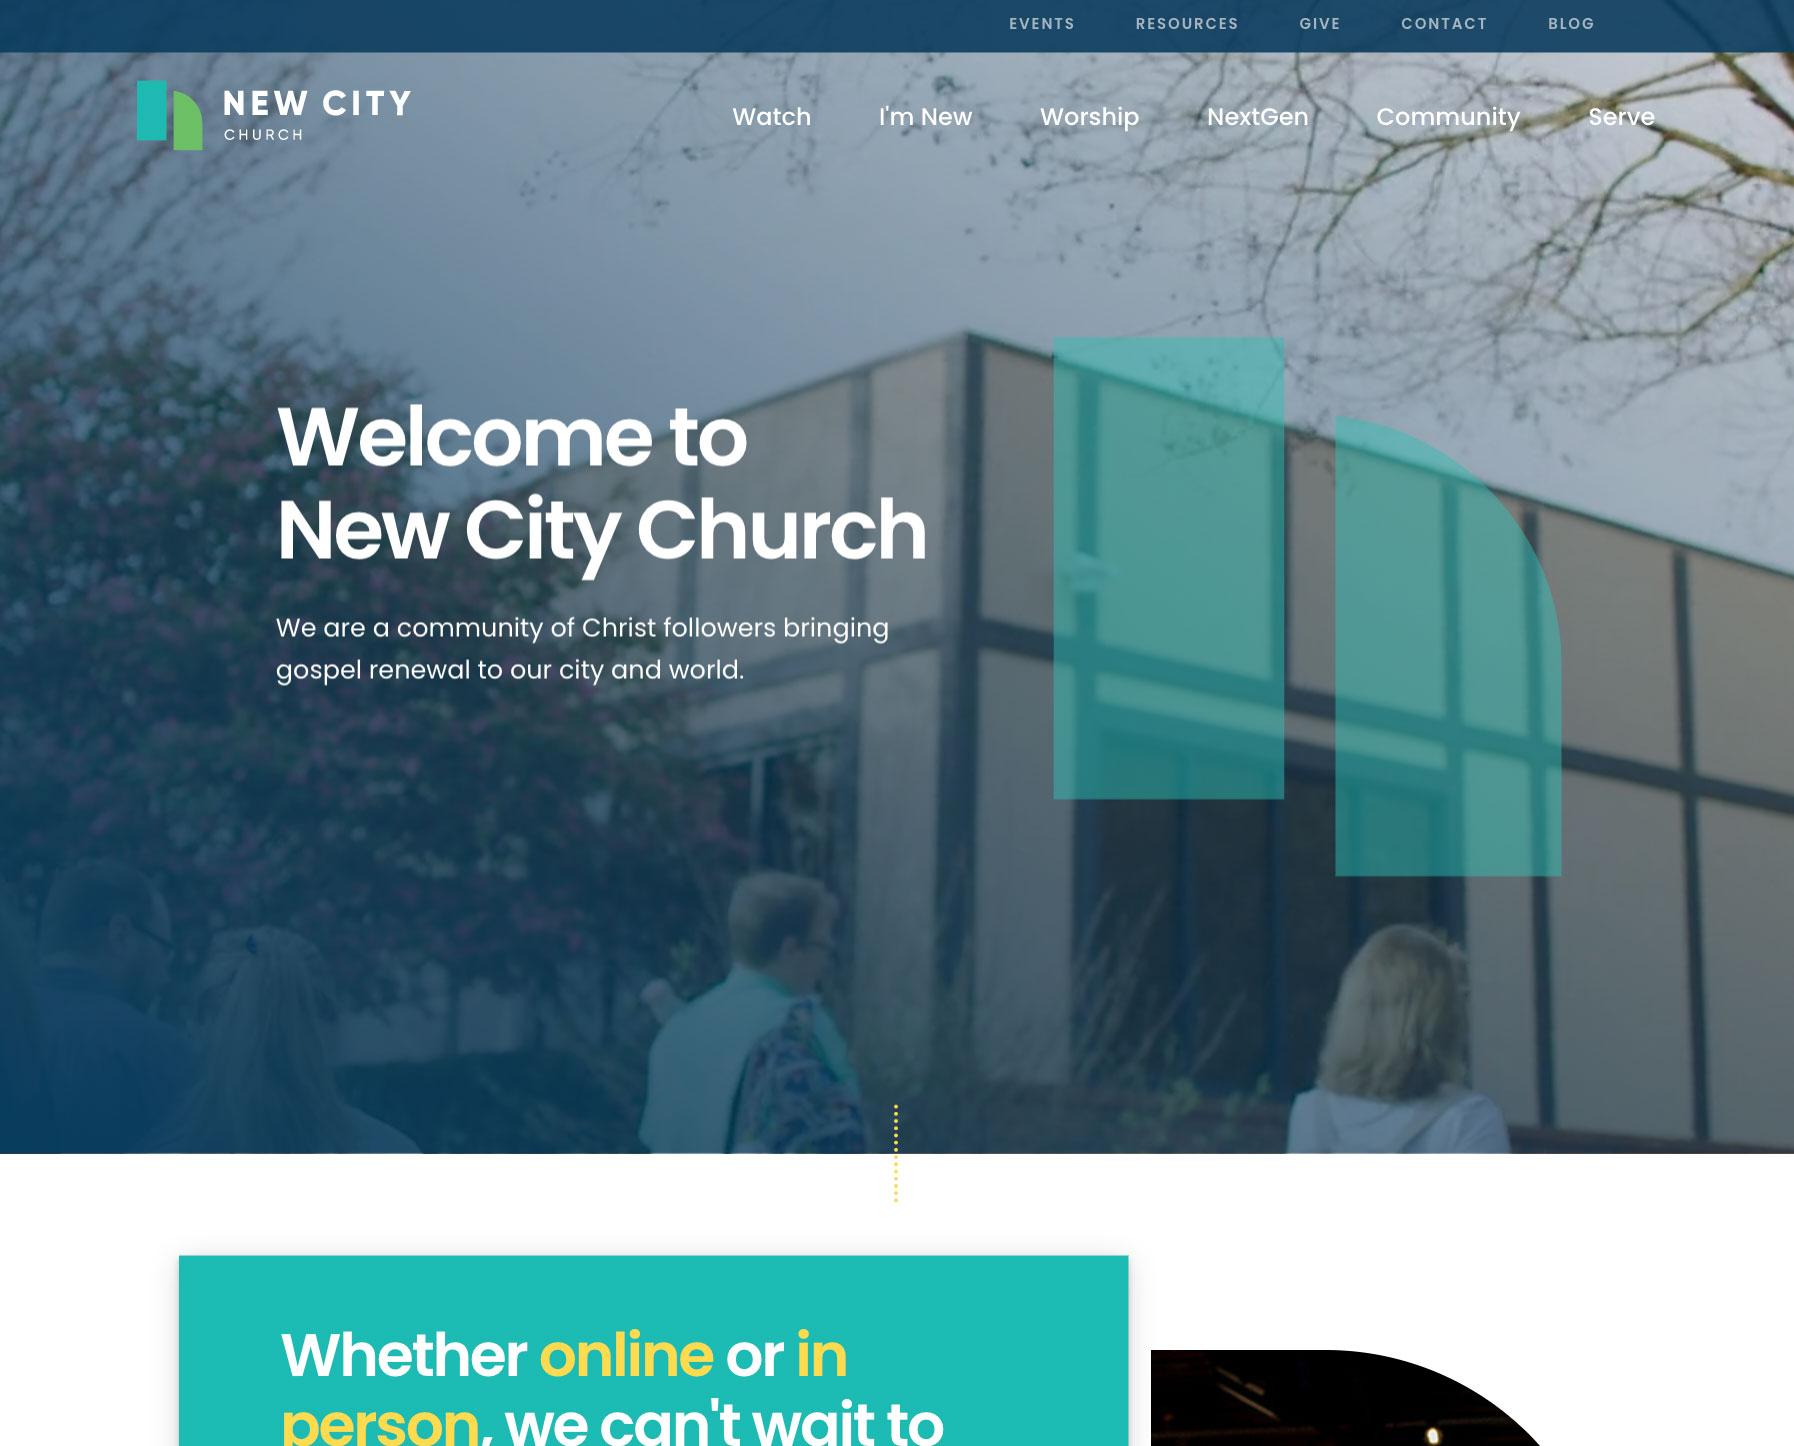 Screenshot of New City Church Website Homepage from https://newcity.us/